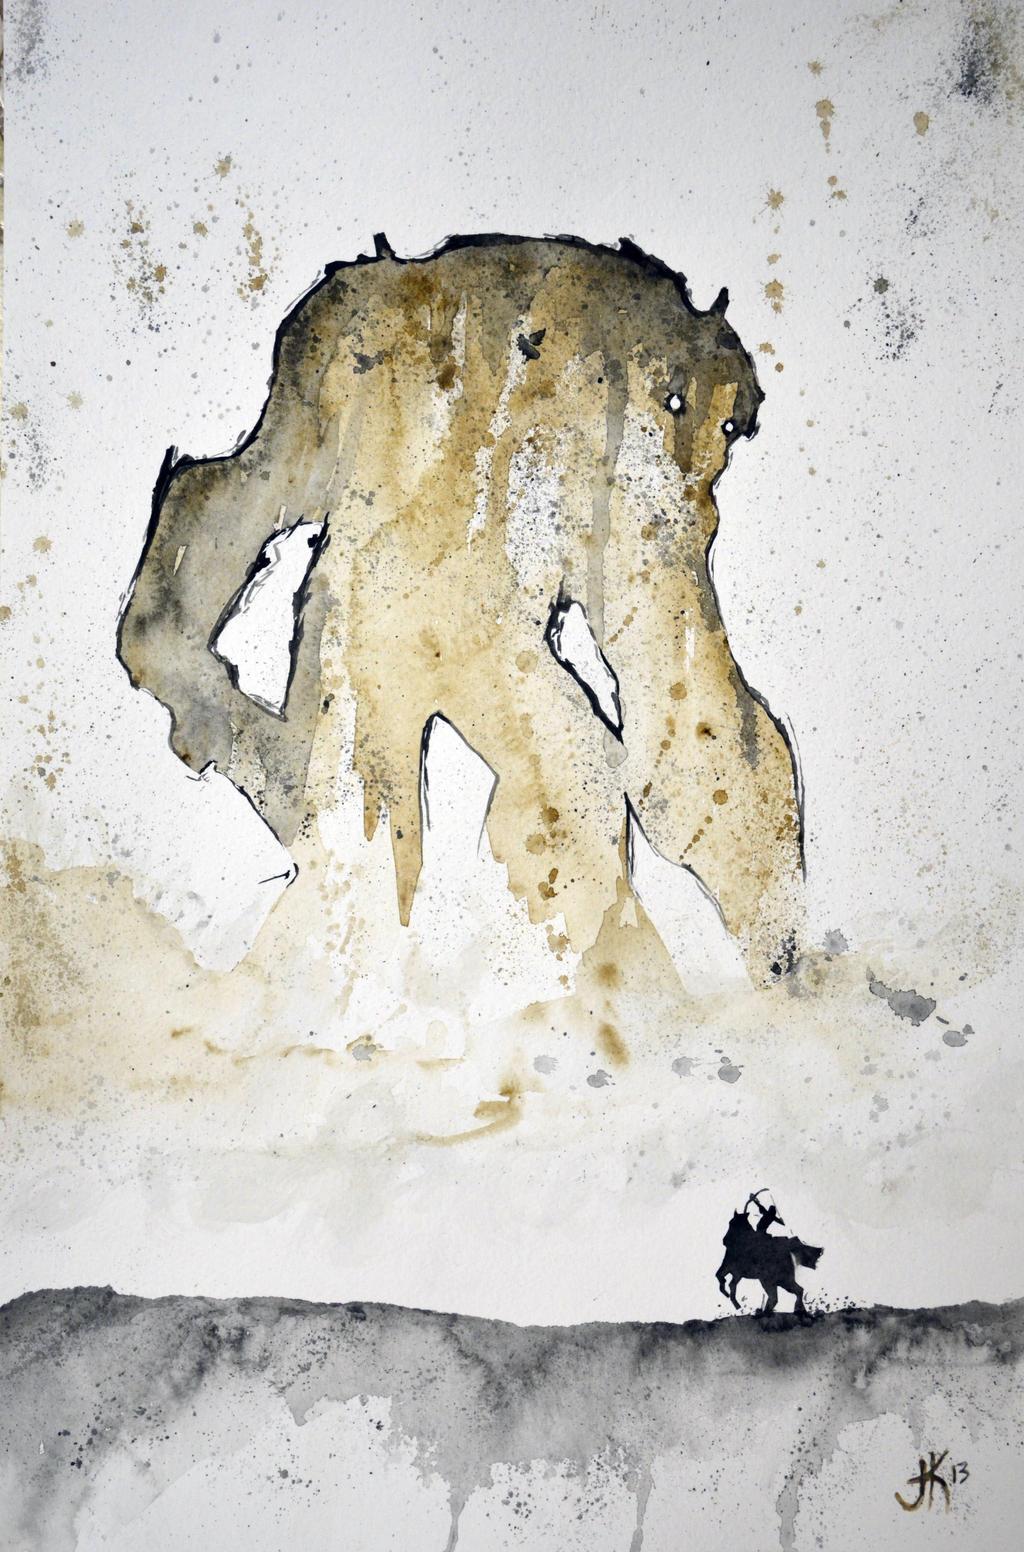 Shadow of the Collosus